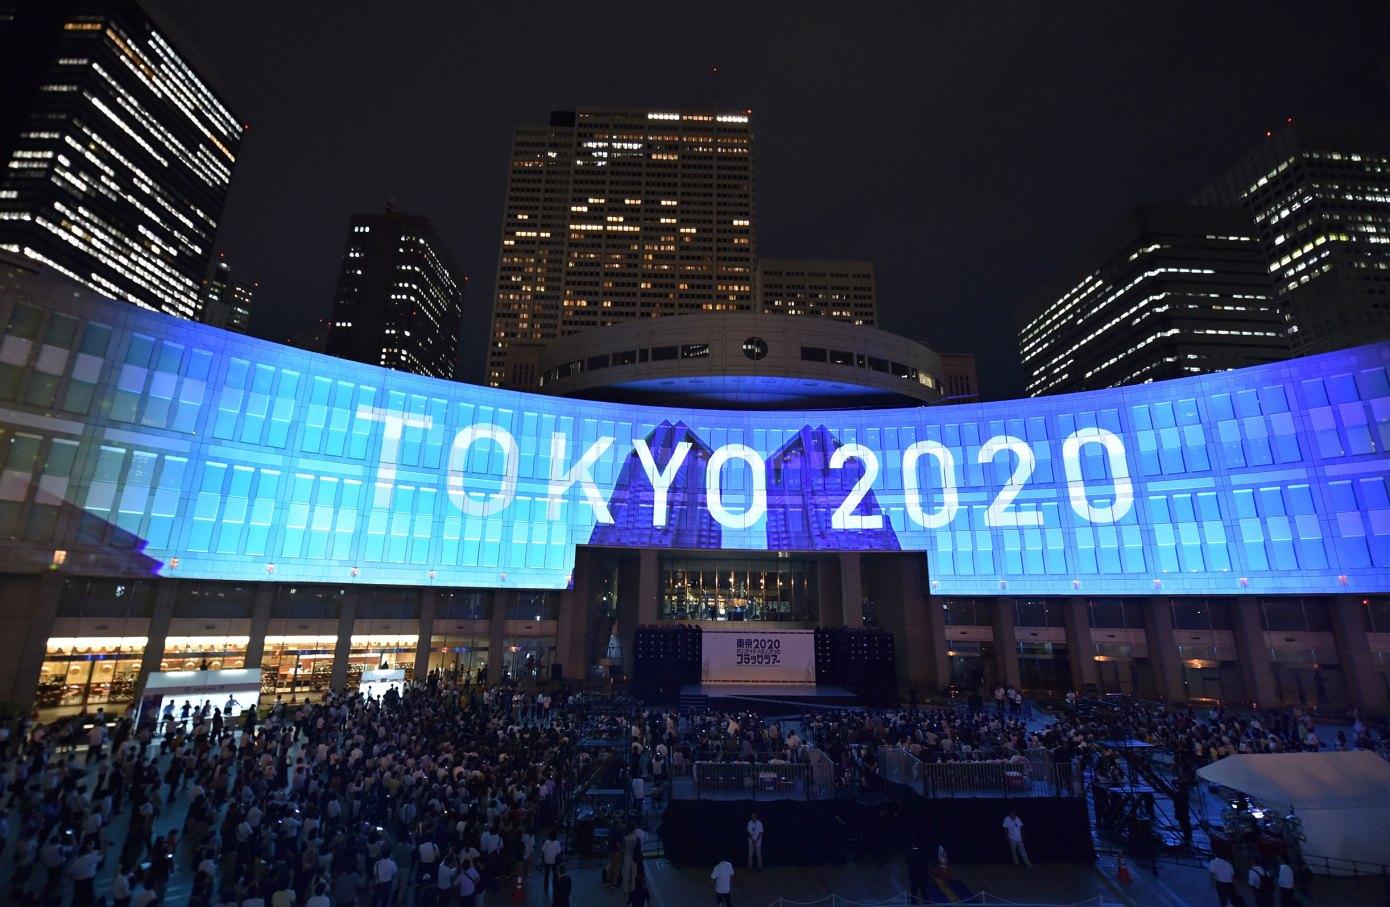 Projekcia nápisu olympíjskych hier Tokio 2020 Japonsko